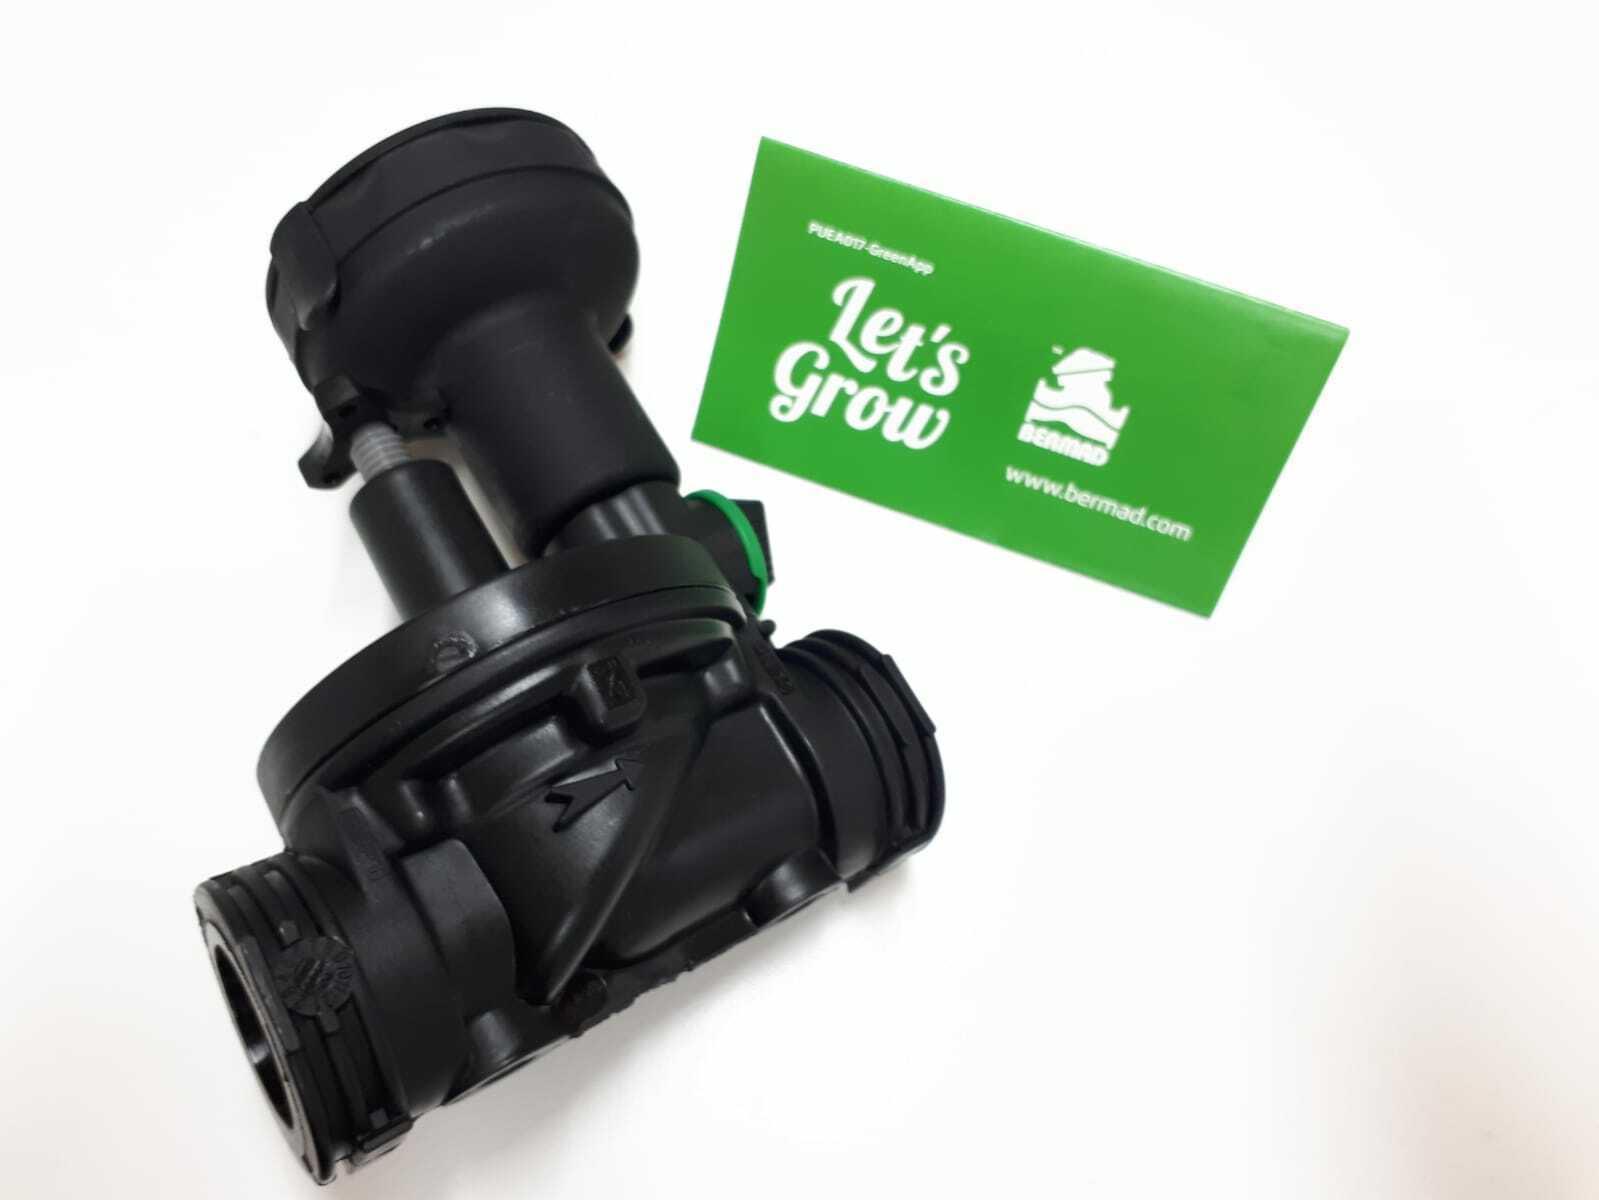 Bermad GreenApp Auto Irrigation Solenoid Controller Valve Bluetooth 3/4